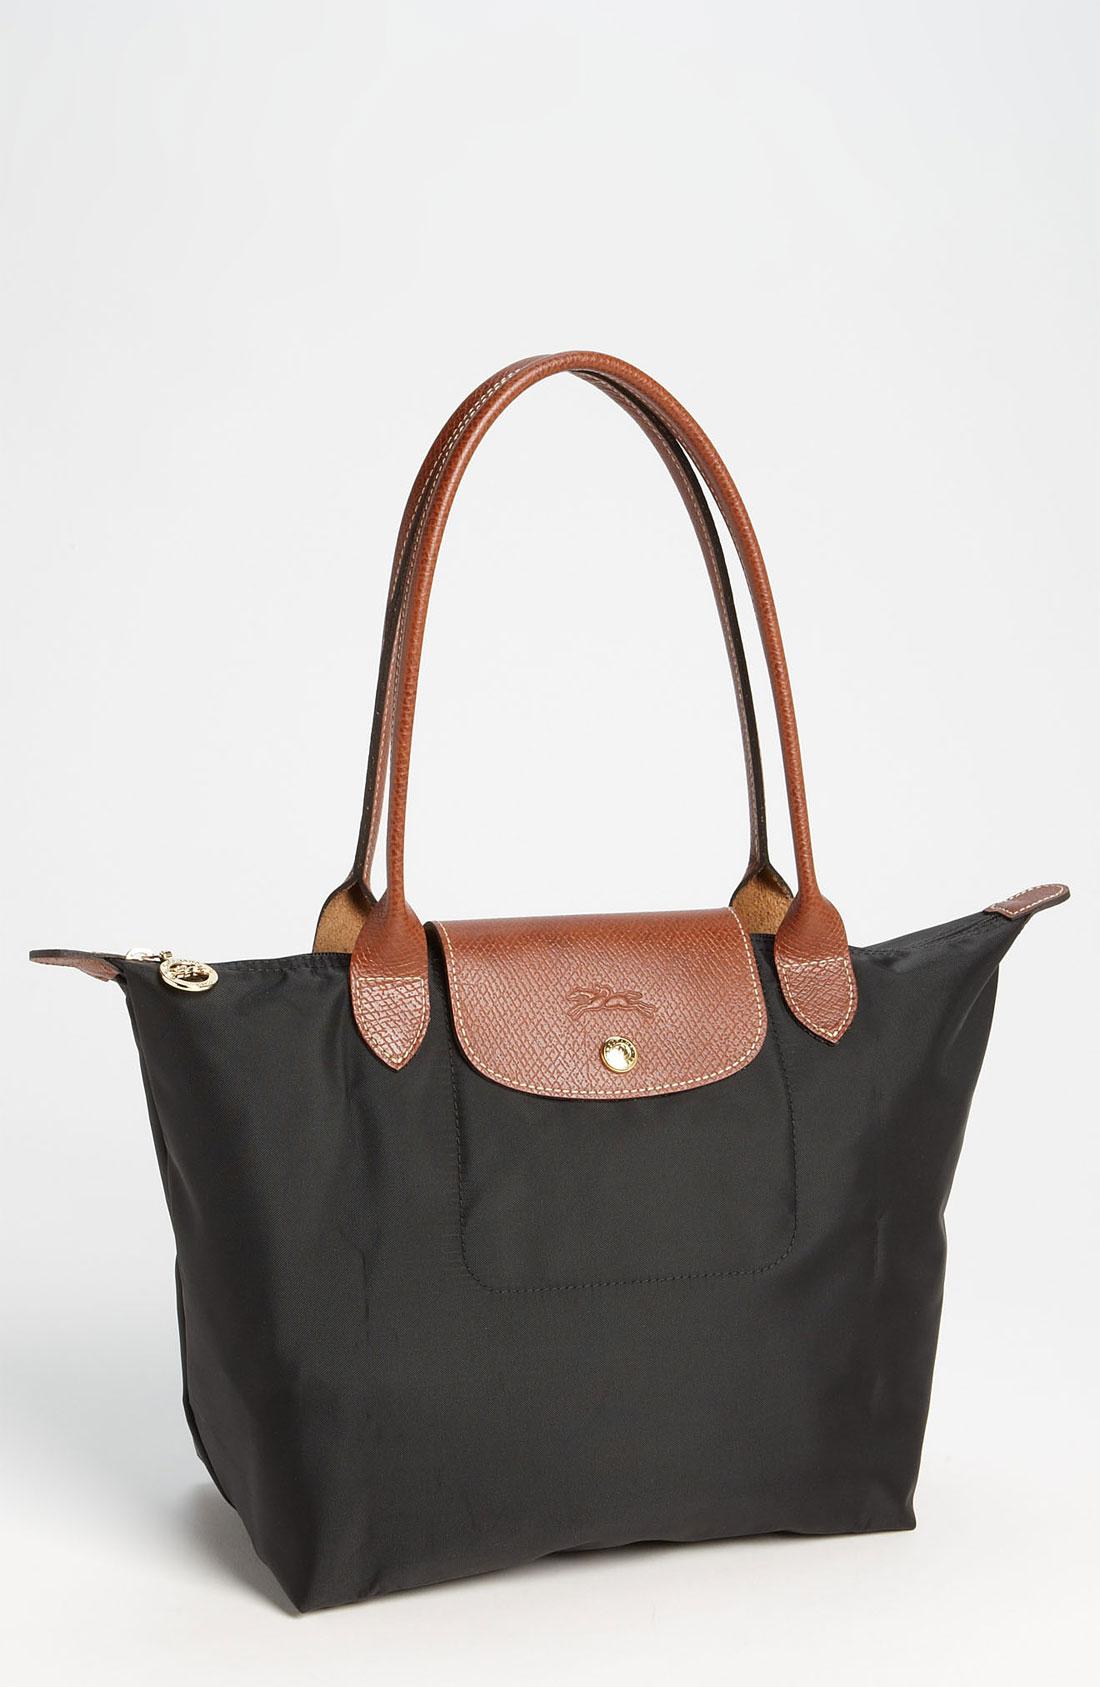 shoulder bag longchamp u0027small le pliageu0027 shoulder tote | nordstrom AJNBKUN